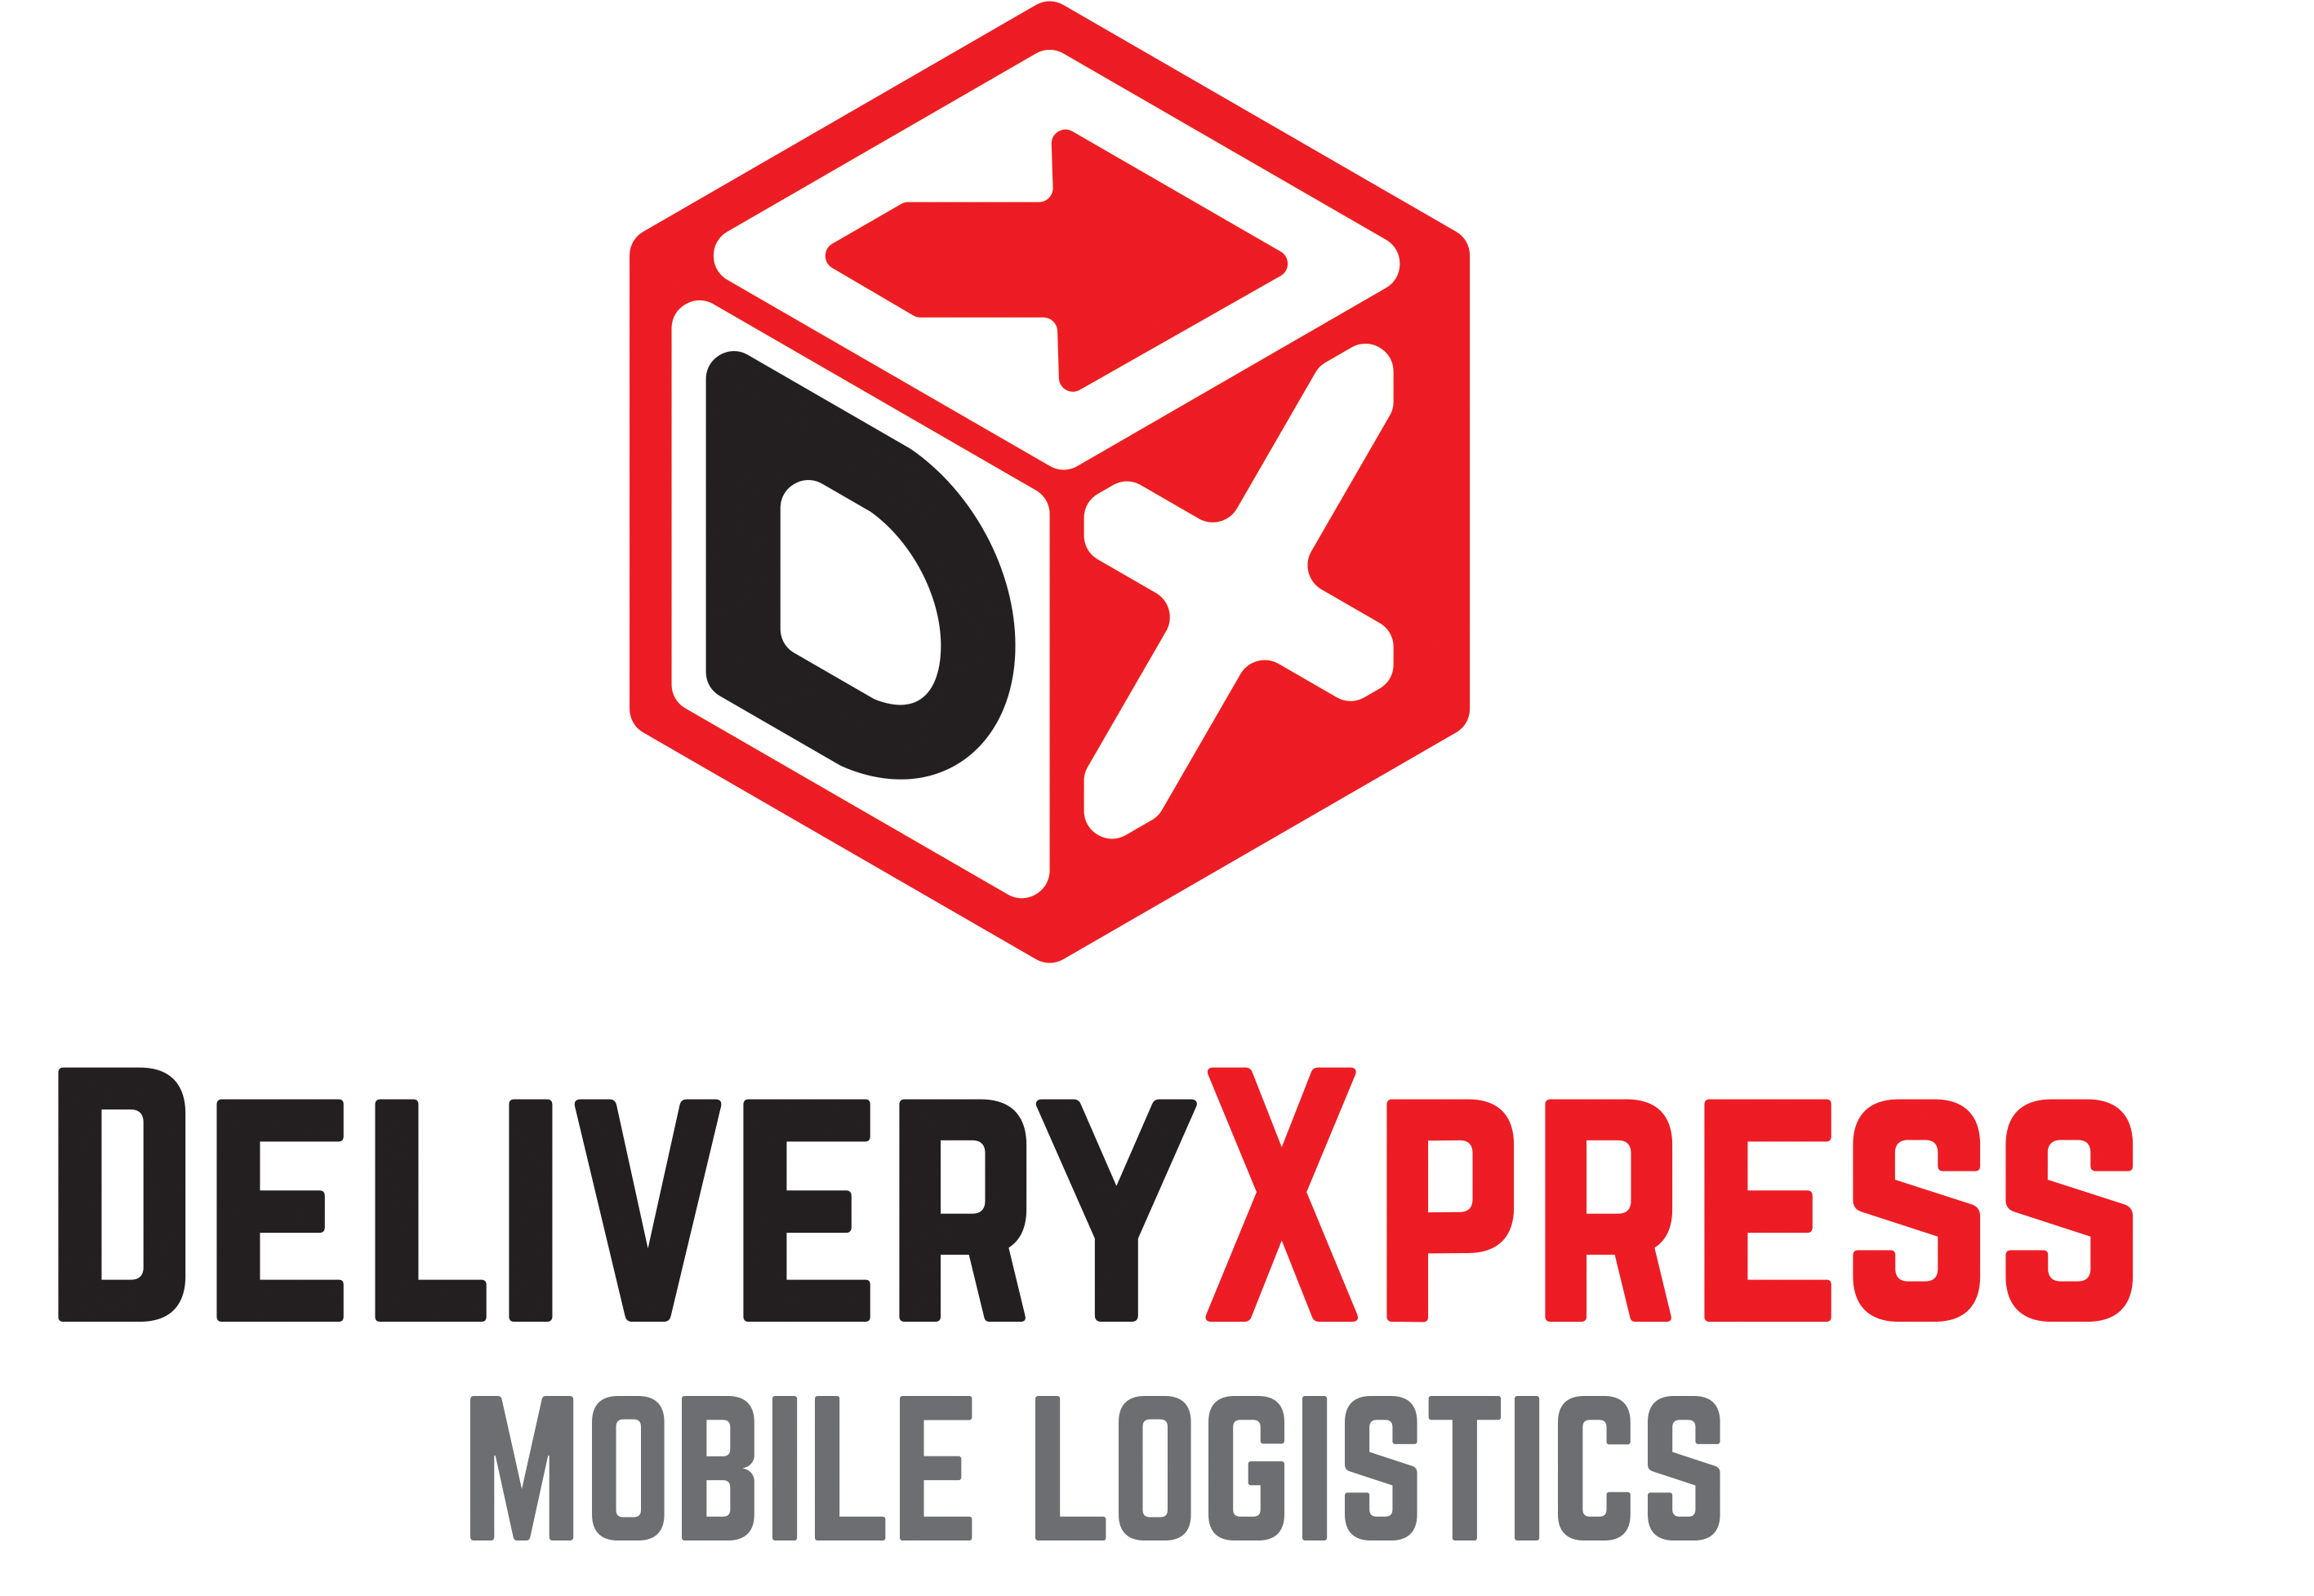 DeliveryXpress Logo7